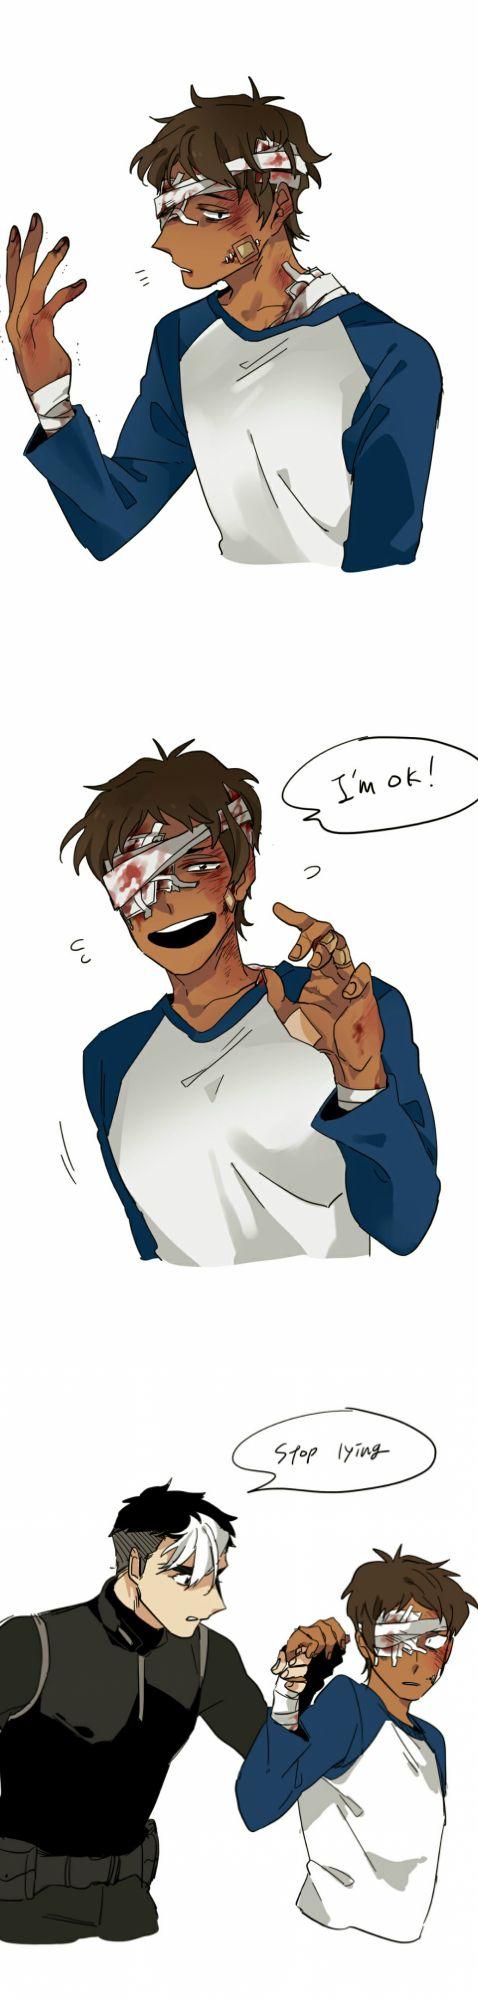 Shiro   Lance Pretty sure Lance will act this way in season 2